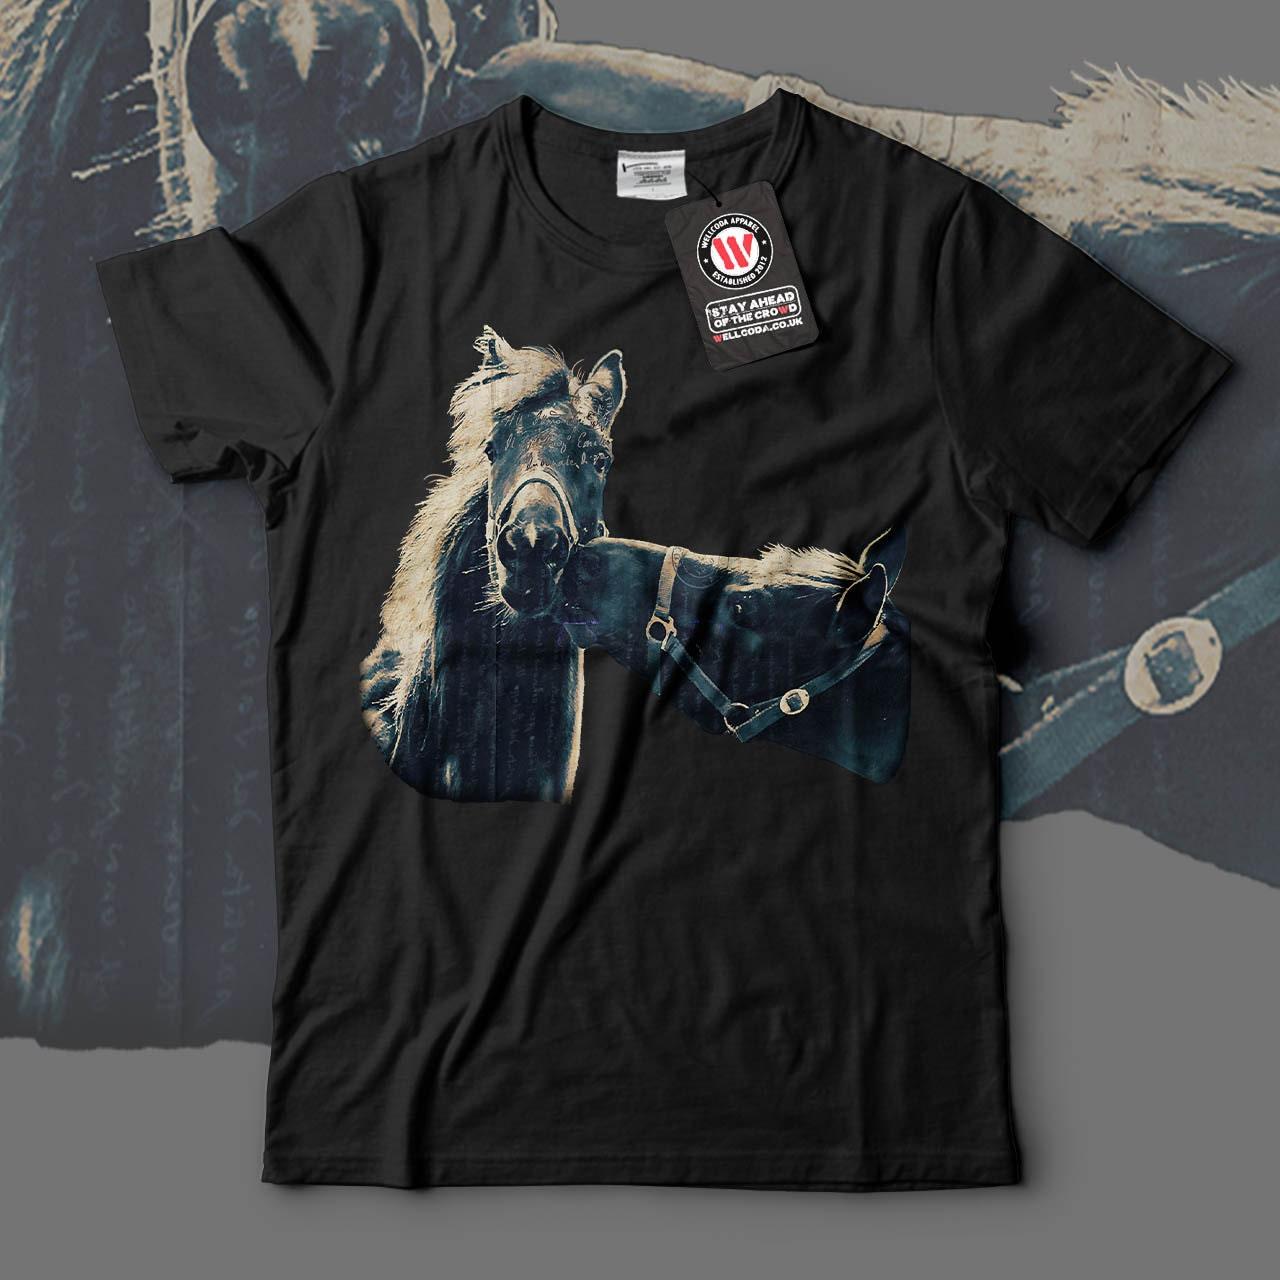 Animal Friendship Horse Beauty Men Black White Grey Red Royal Blue Tshirt S5XL NEW  Wellcoda y2146